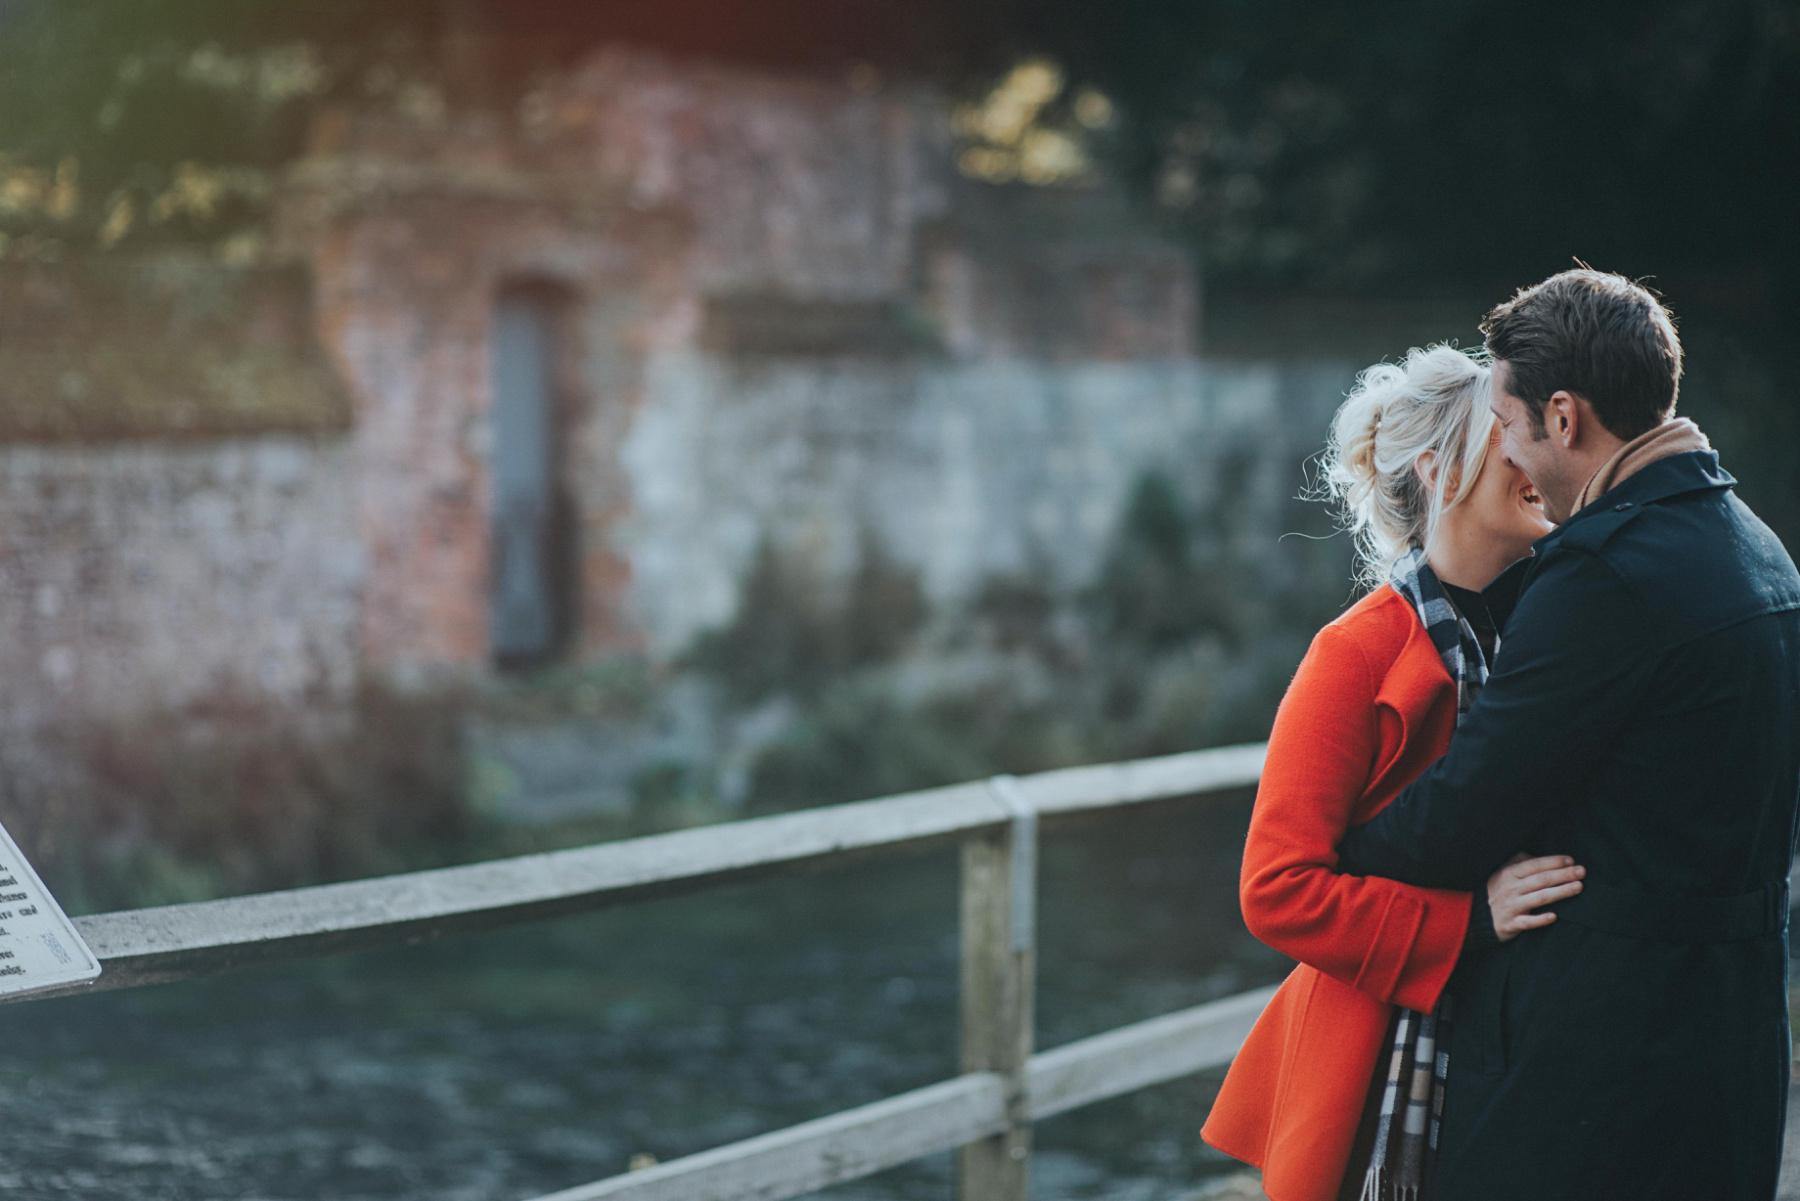 Red coat in photos